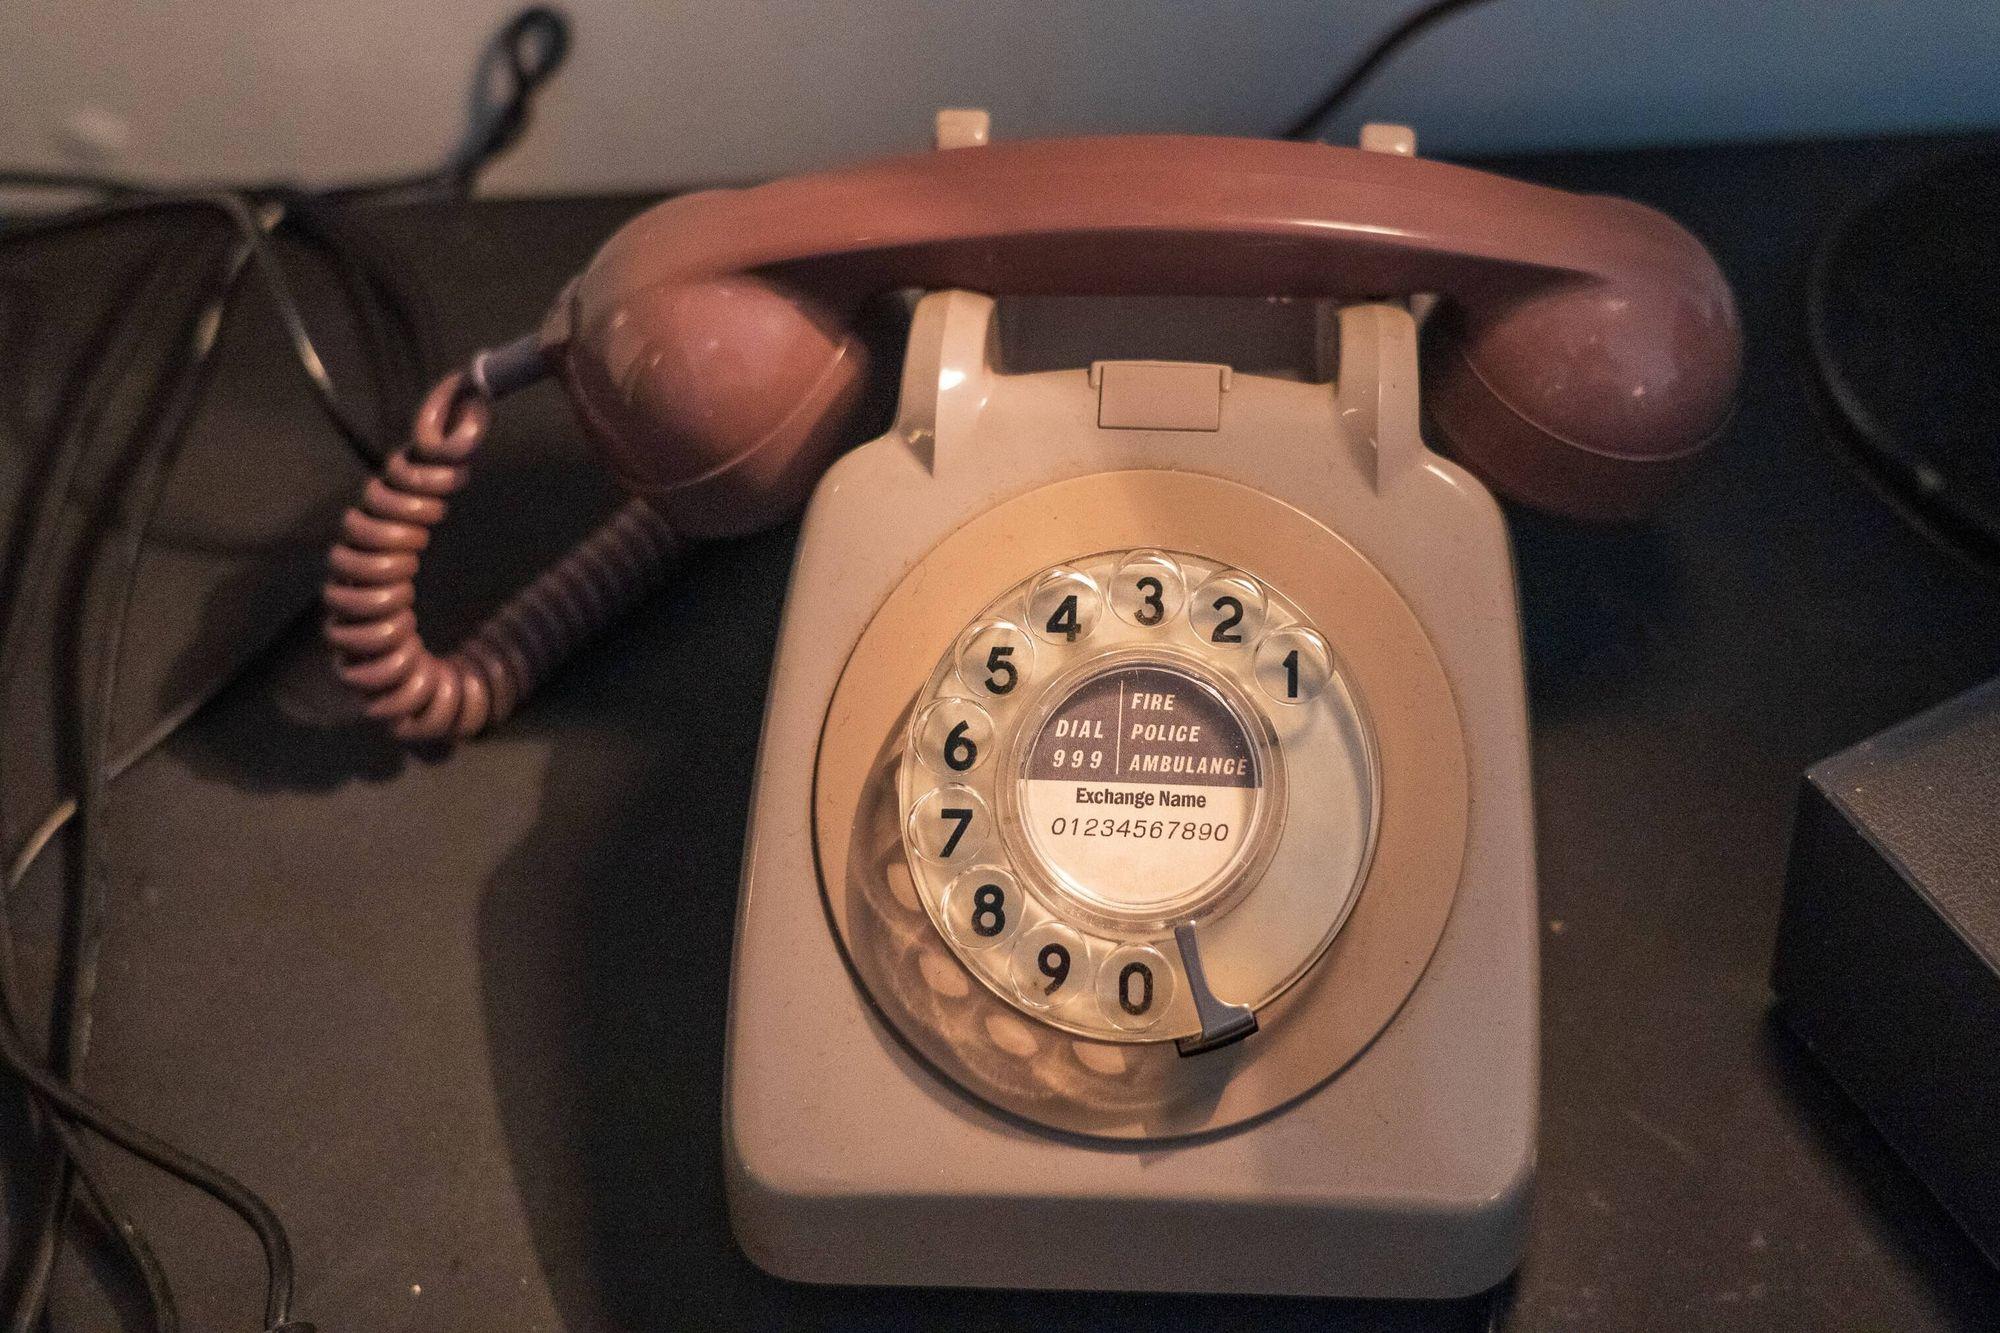 A beige corded rotary phone